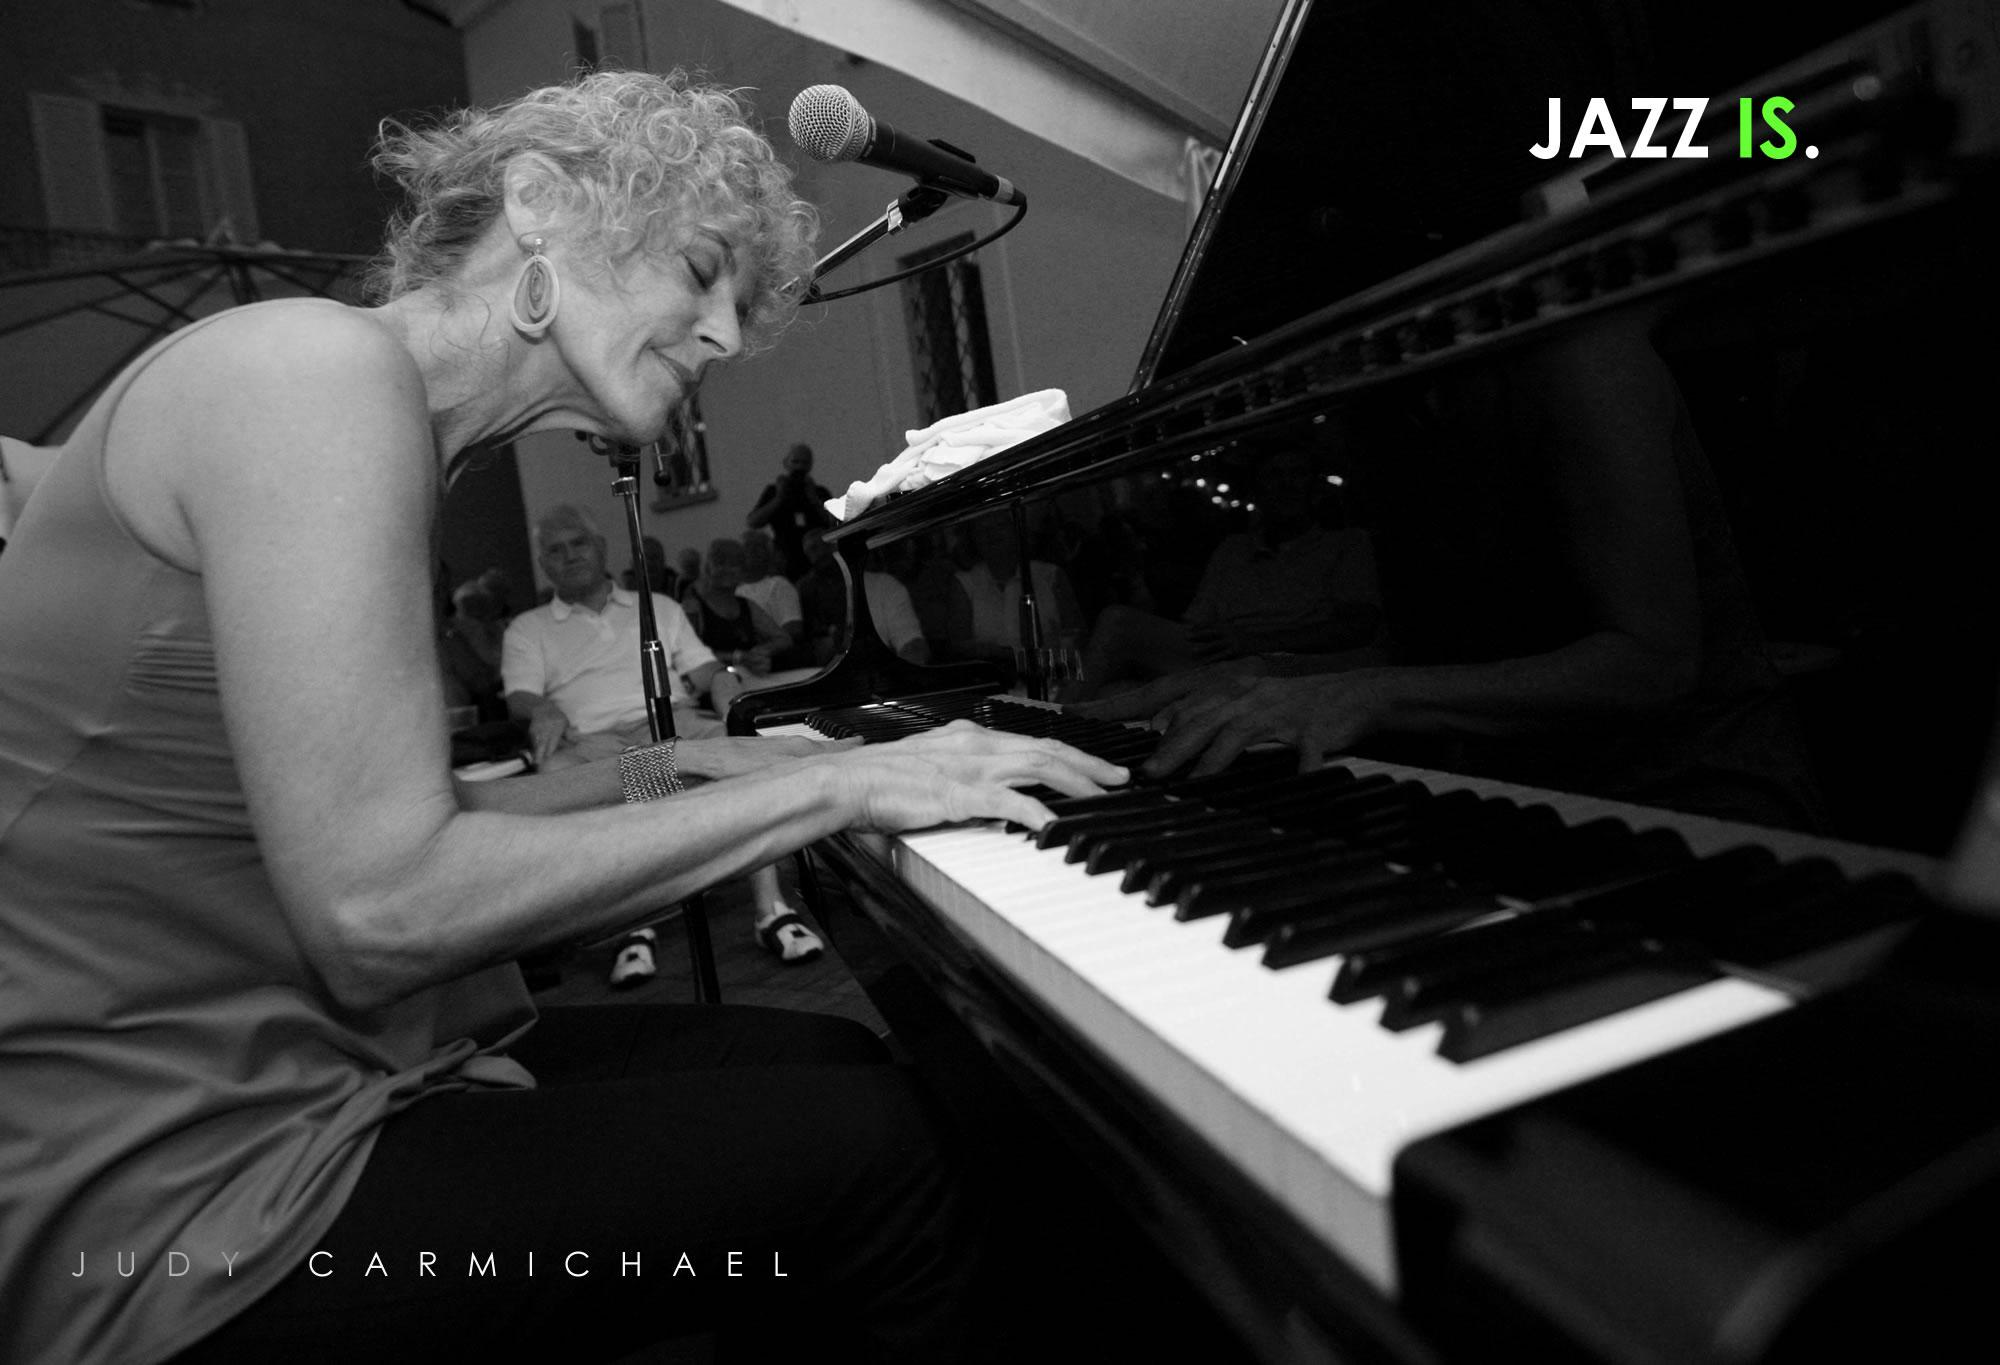 Jazz is - judy carmichael